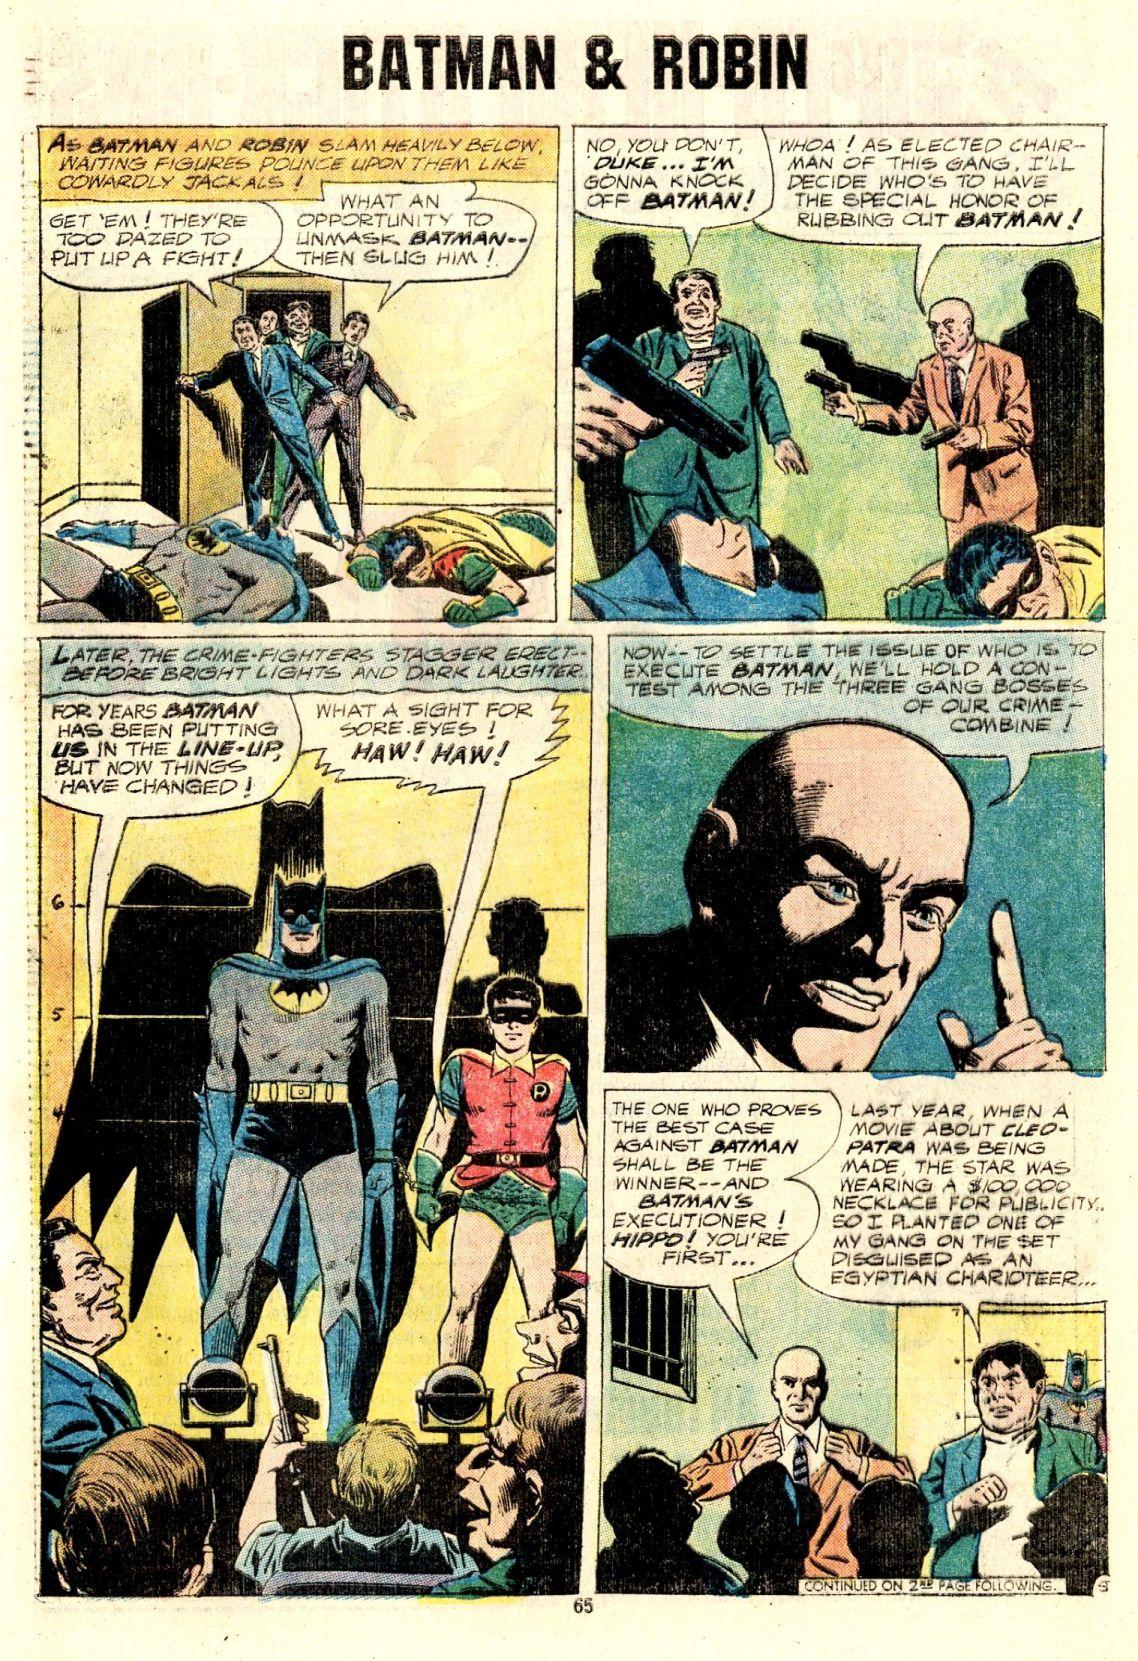 Detective Comics (1937) 438 Page 65